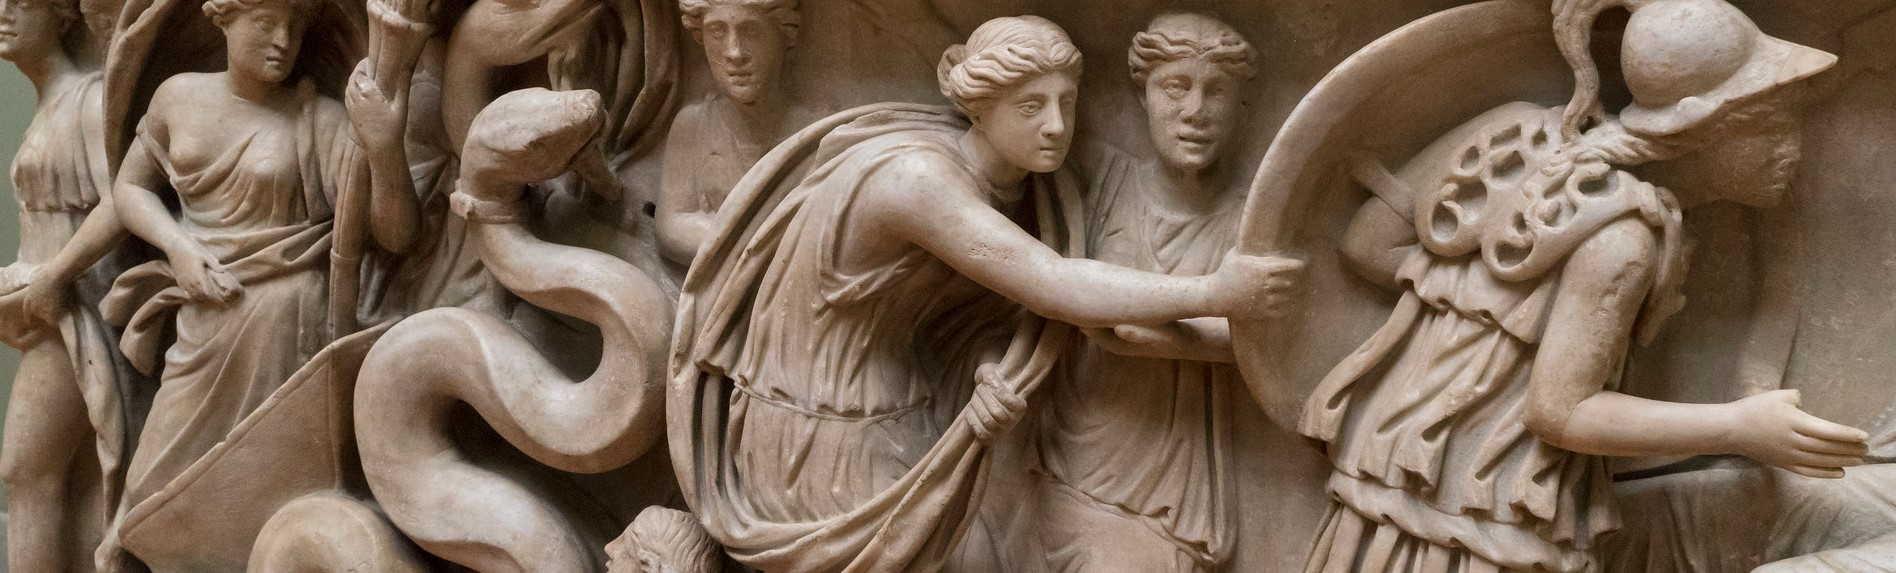 Why you should visit Gallerie Degli Uffizi